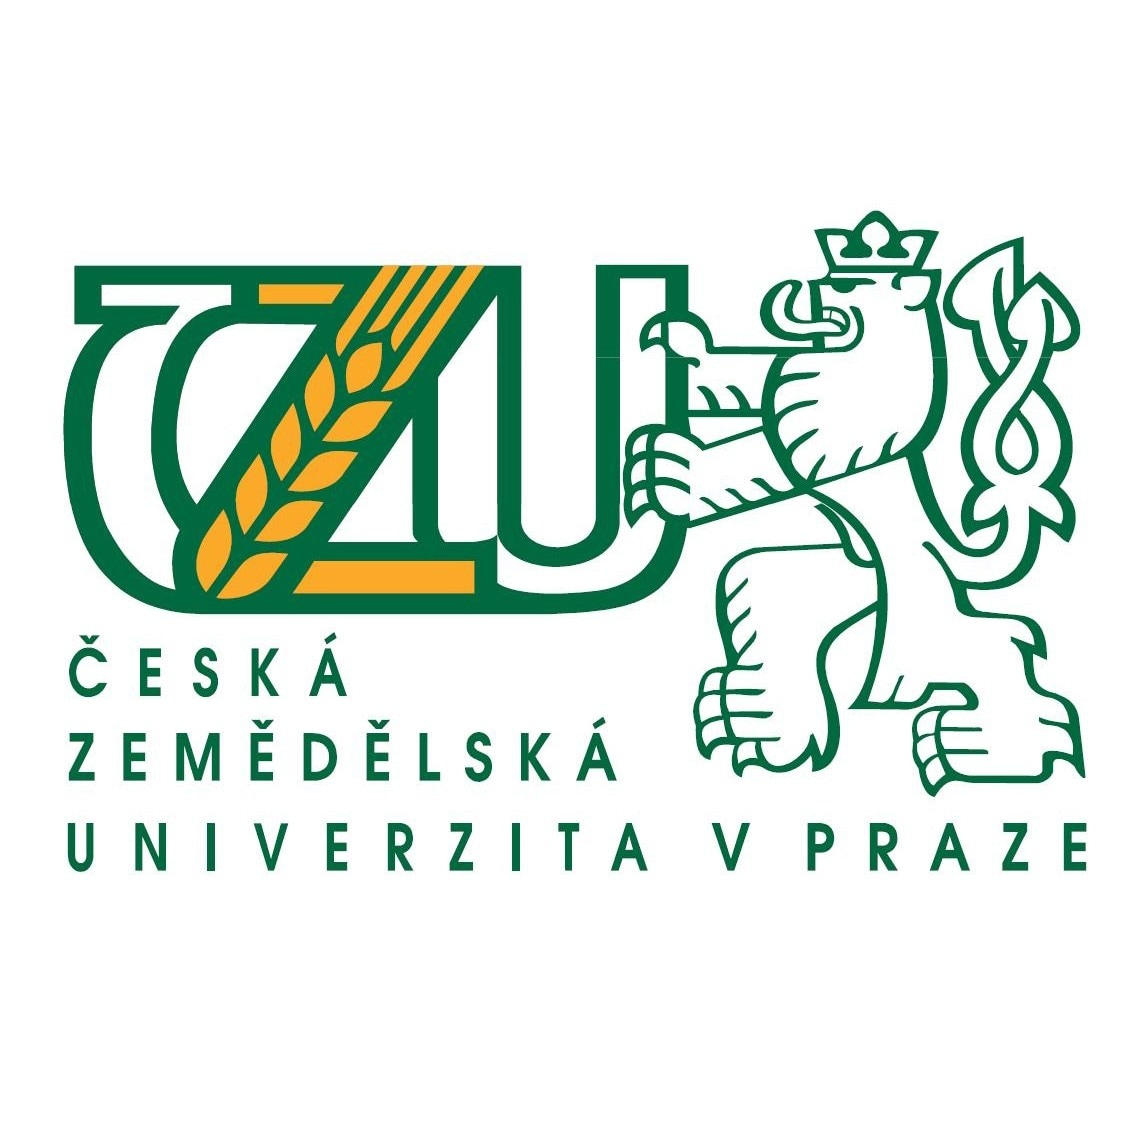 Ceska zemedelska univerzita v Praze